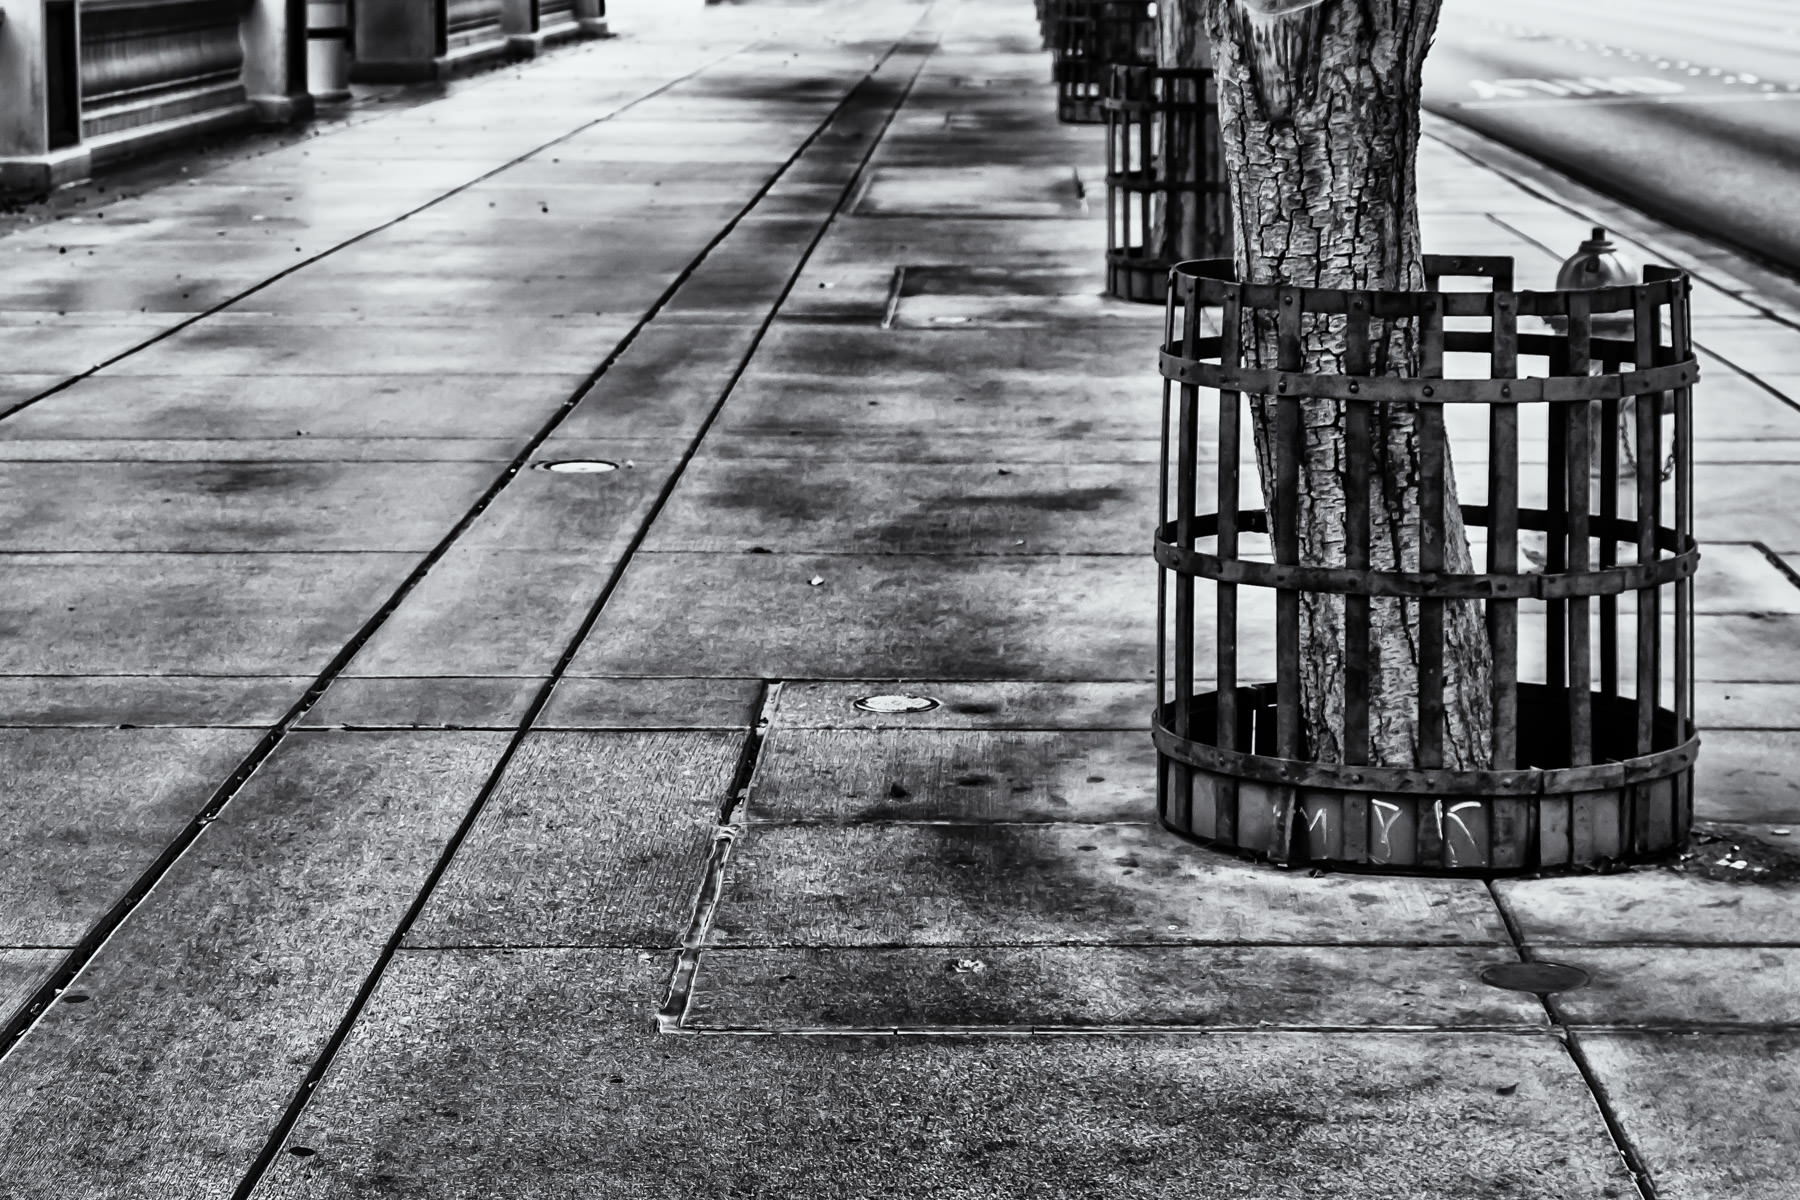 Trees grow along the Las Vegas Boulevard sidewalk in front of the Bellagio.